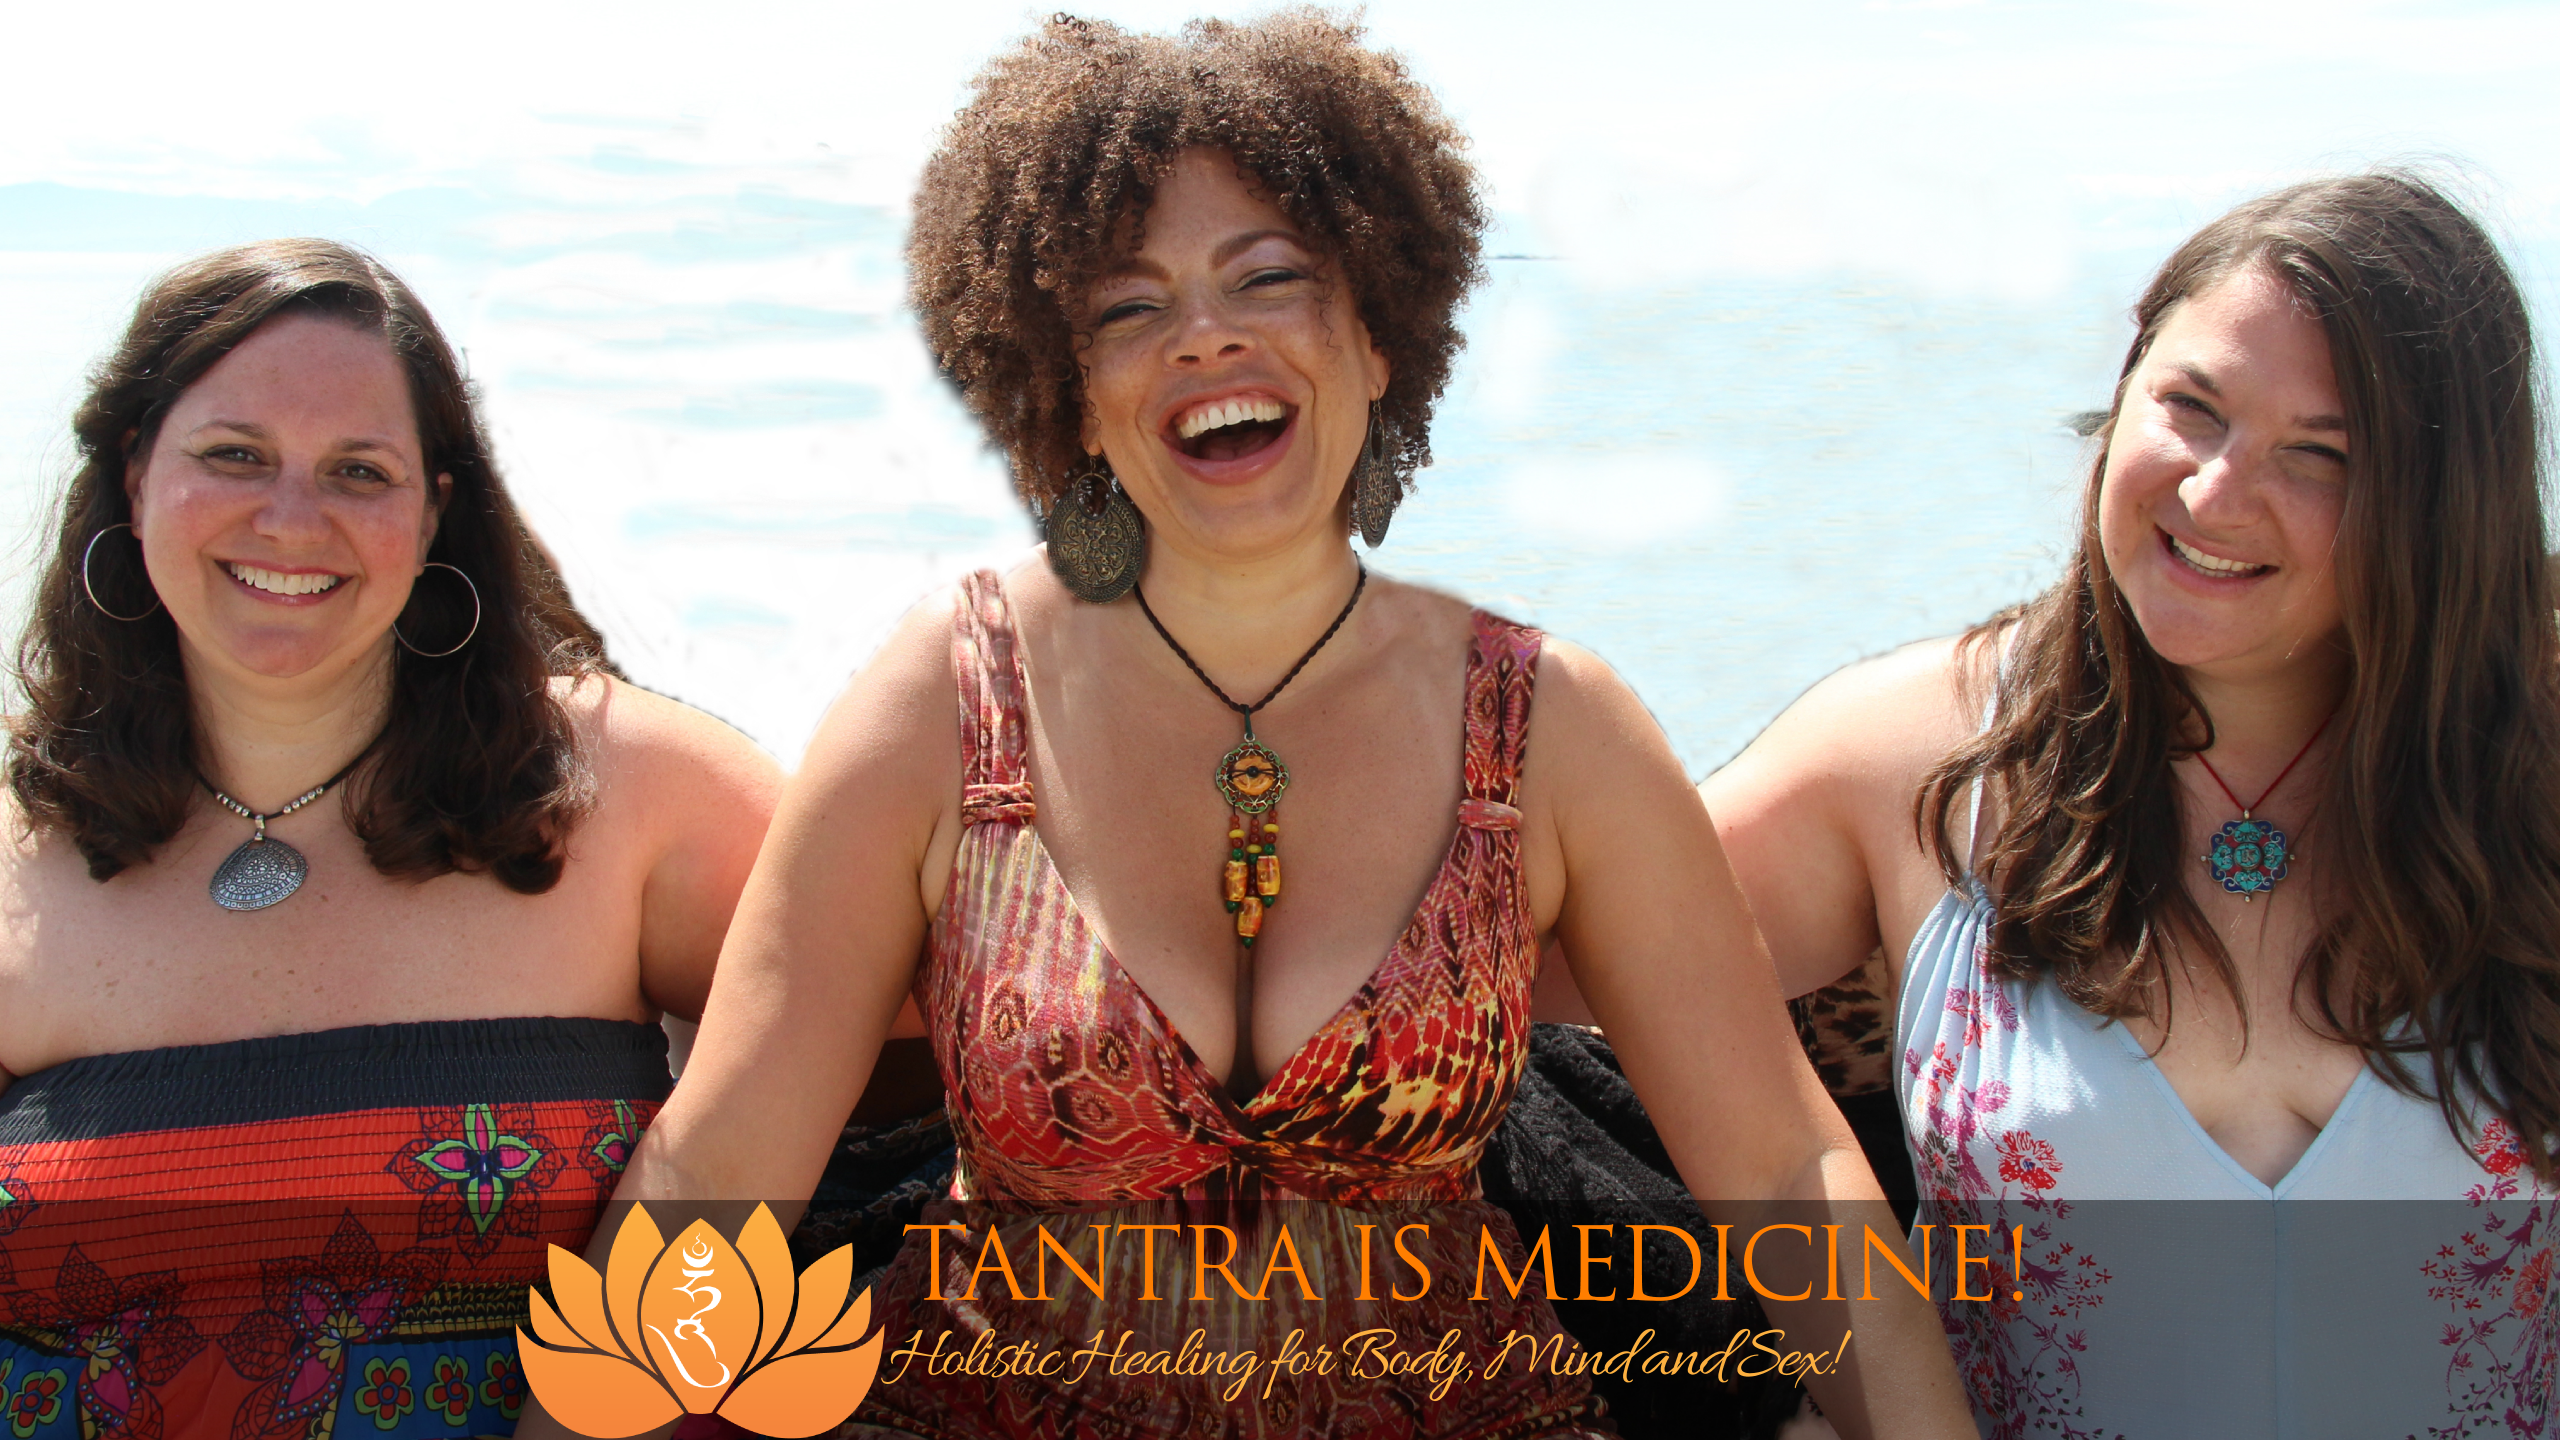 Tantra is Medicine